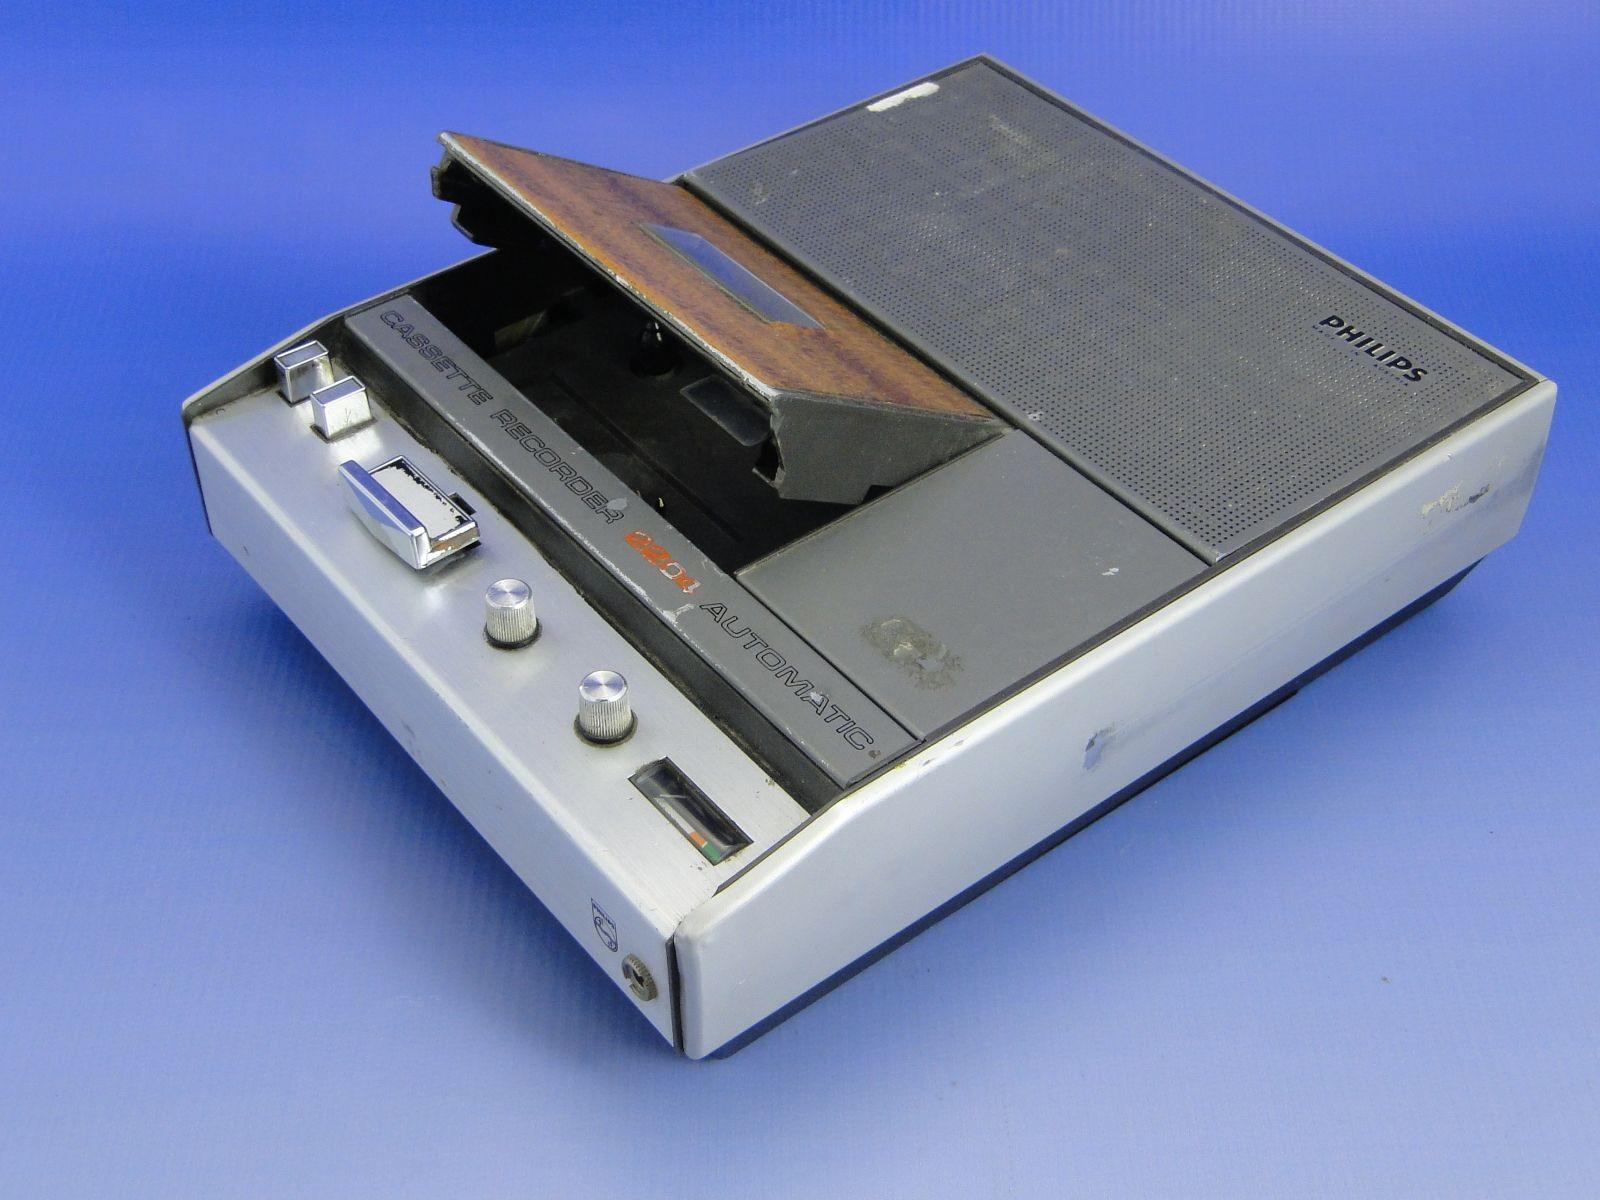 DSC07097.JPG (1600×1200)